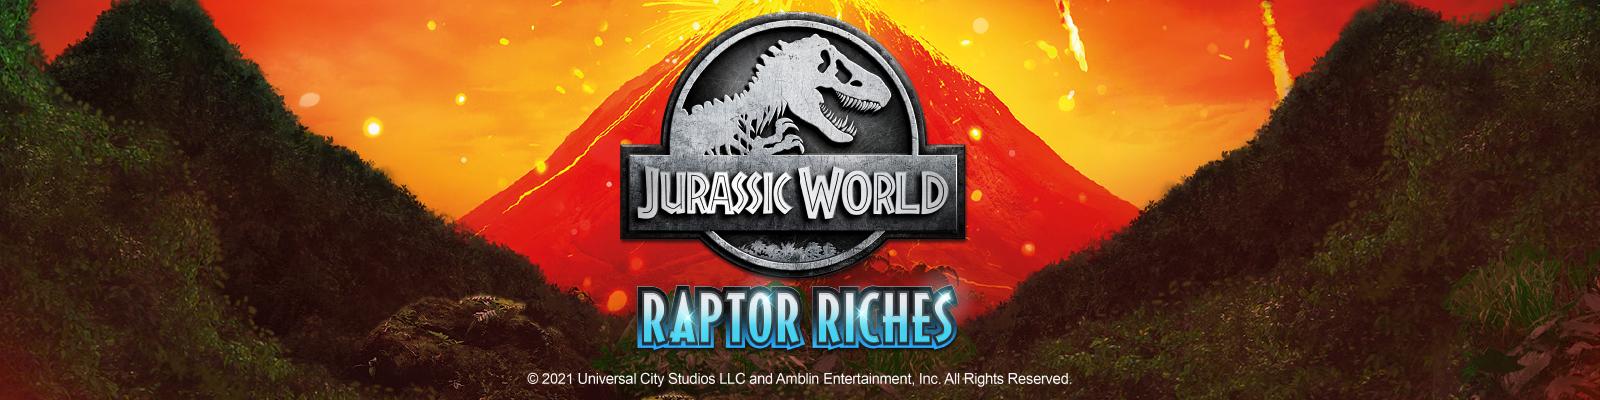 Jurassic World: Raptor Riches – Microgaming